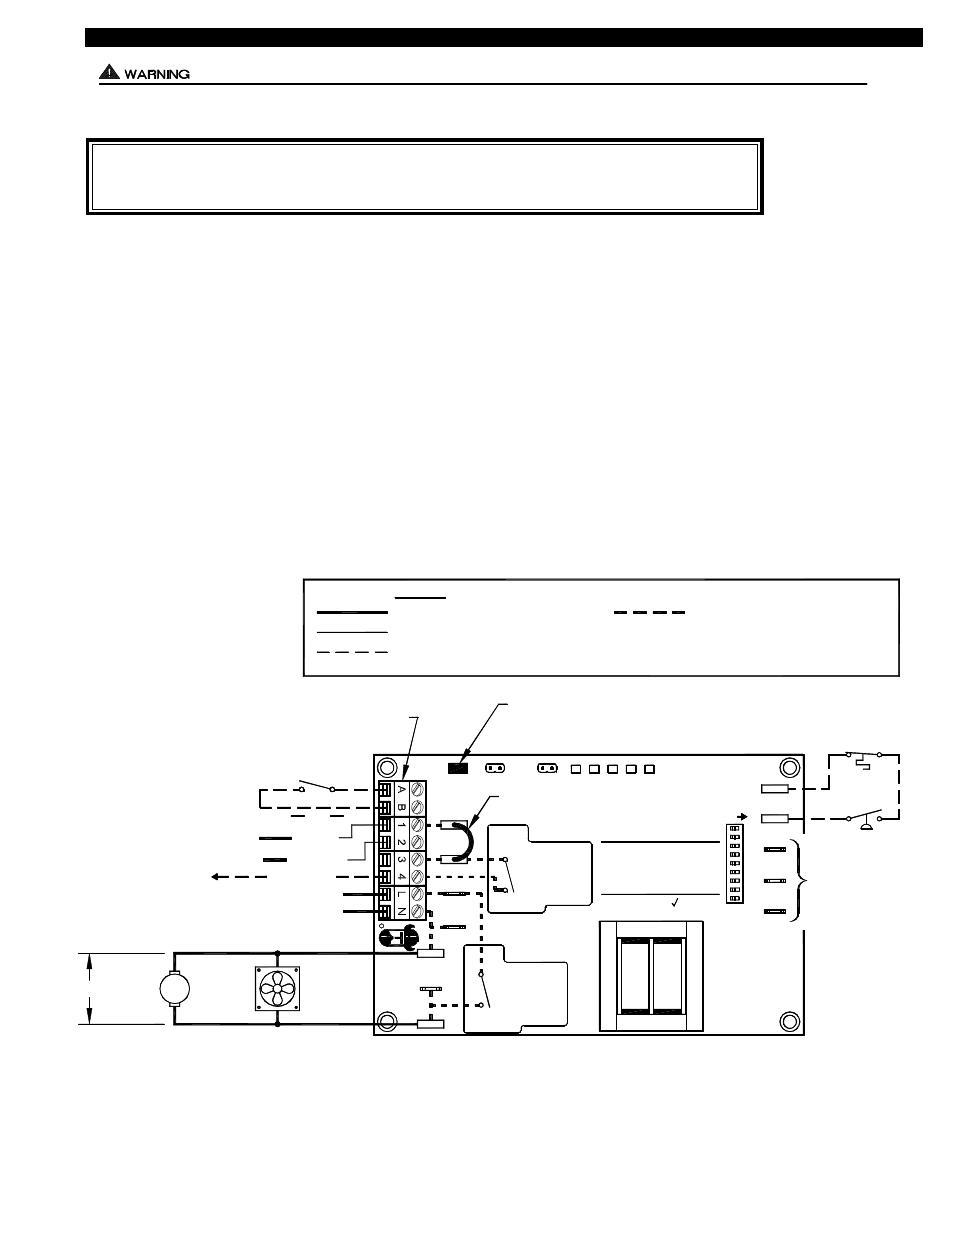 hight resolution of ss2 wiring diagram wiring diagram data name nema ss2 50p wiring diagram ss2 wiring diagram